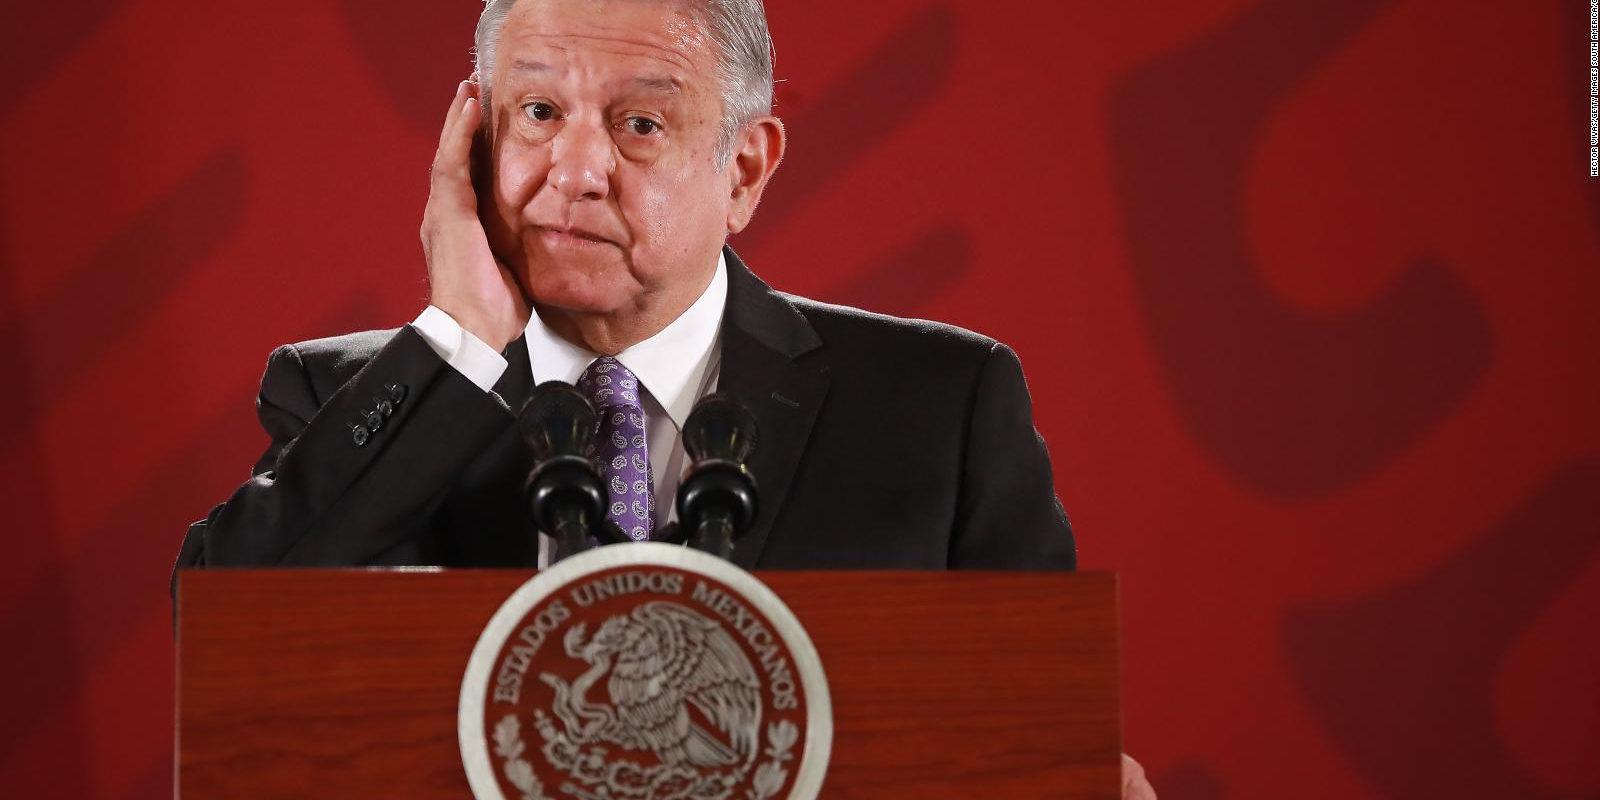 Andrés Manuel López Obrador espera que España reconsidere su postura y pida perdón a México